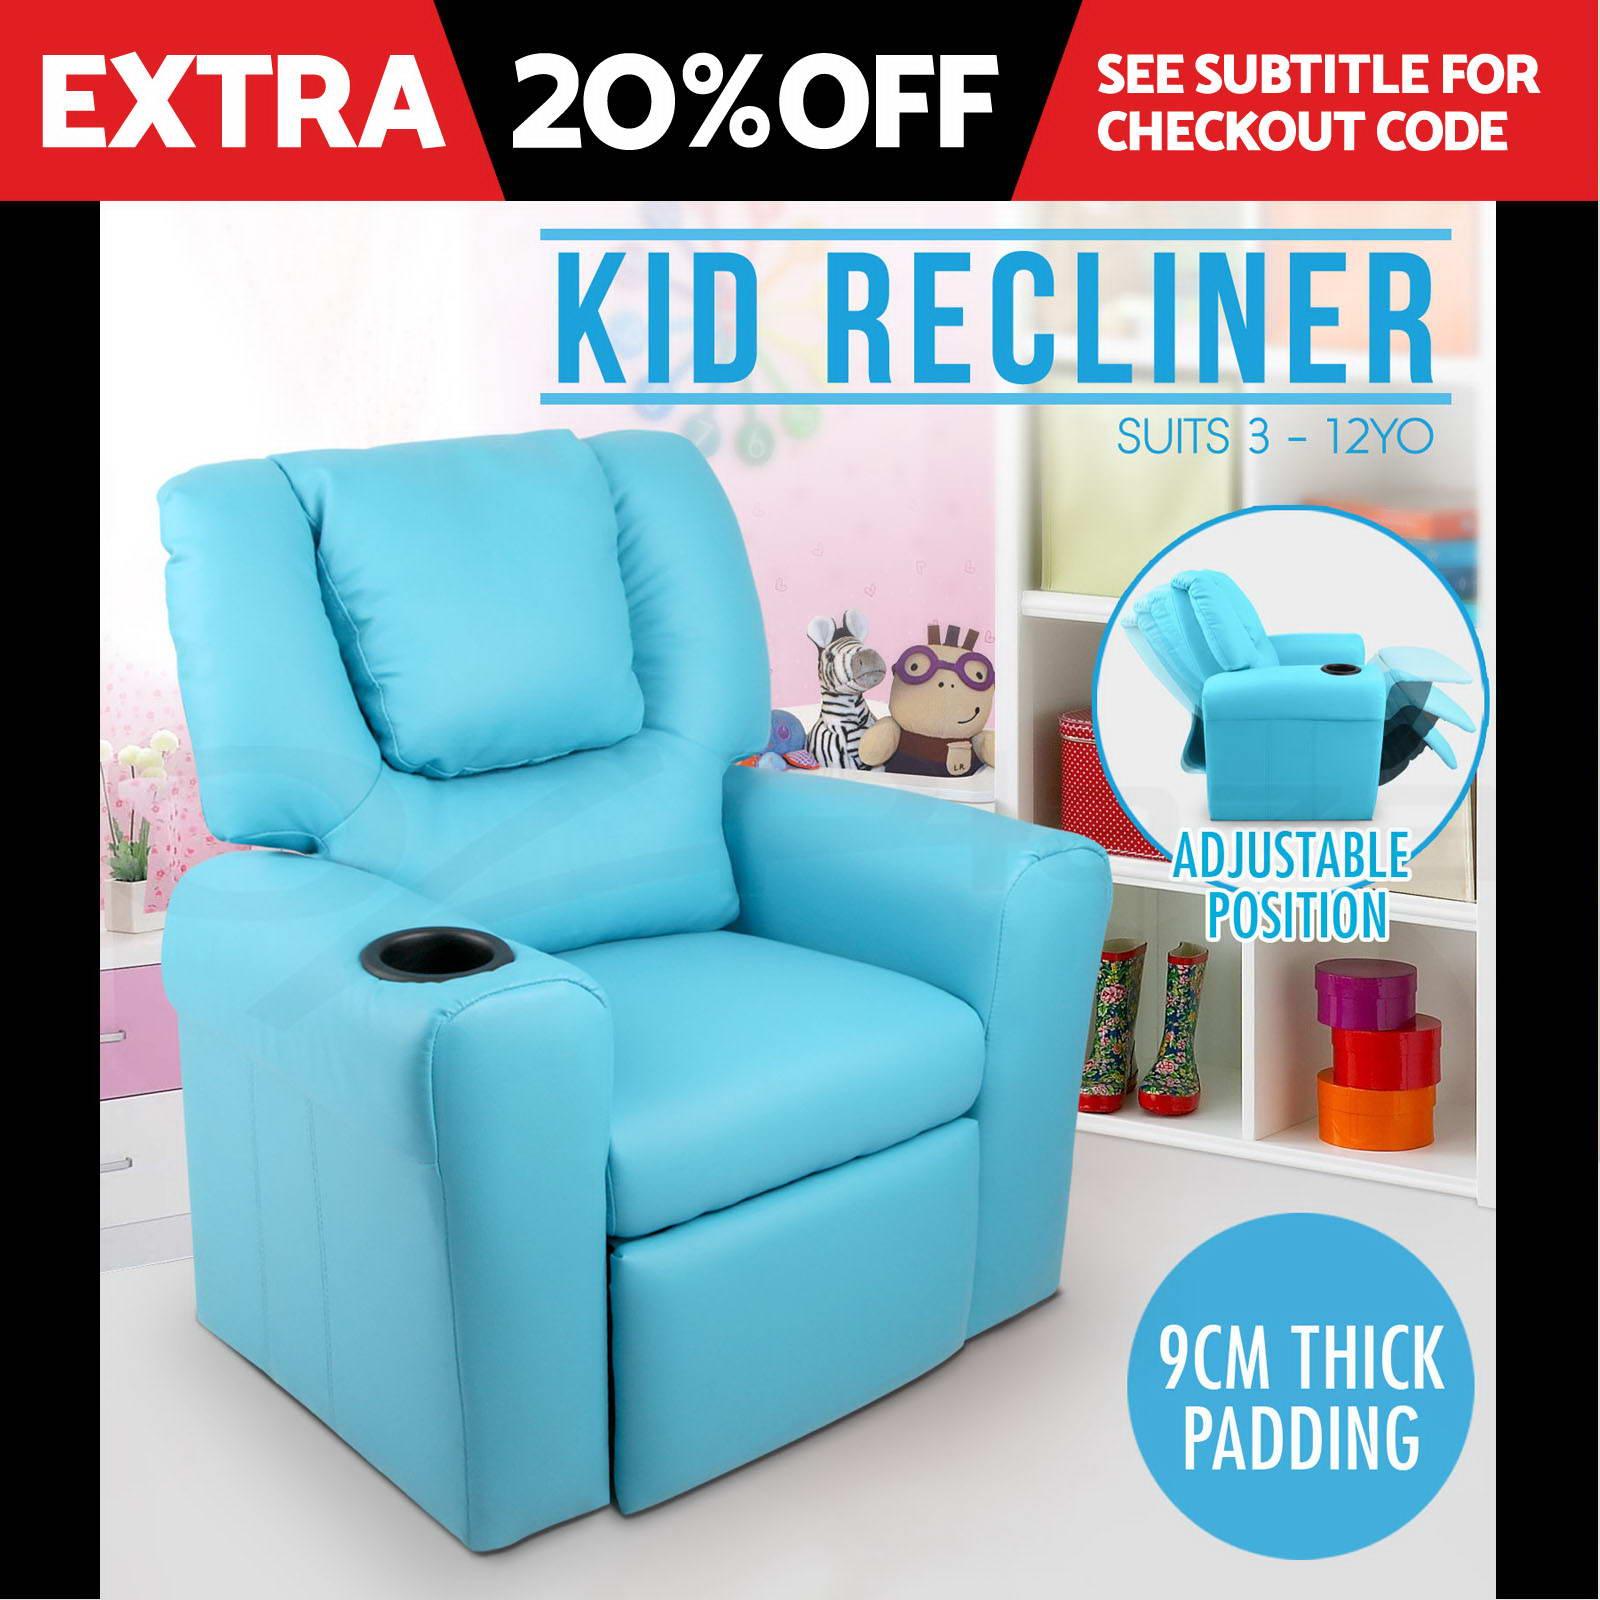 Image is loading Luxury-Kids-Recliner-Sofa-Children-Lounge-Chair-Padded-  sc 1 st  eBay & Luxury Kids Recliner Sofa Children Lounge Chair Padded PU Leather ... islam-shia.org